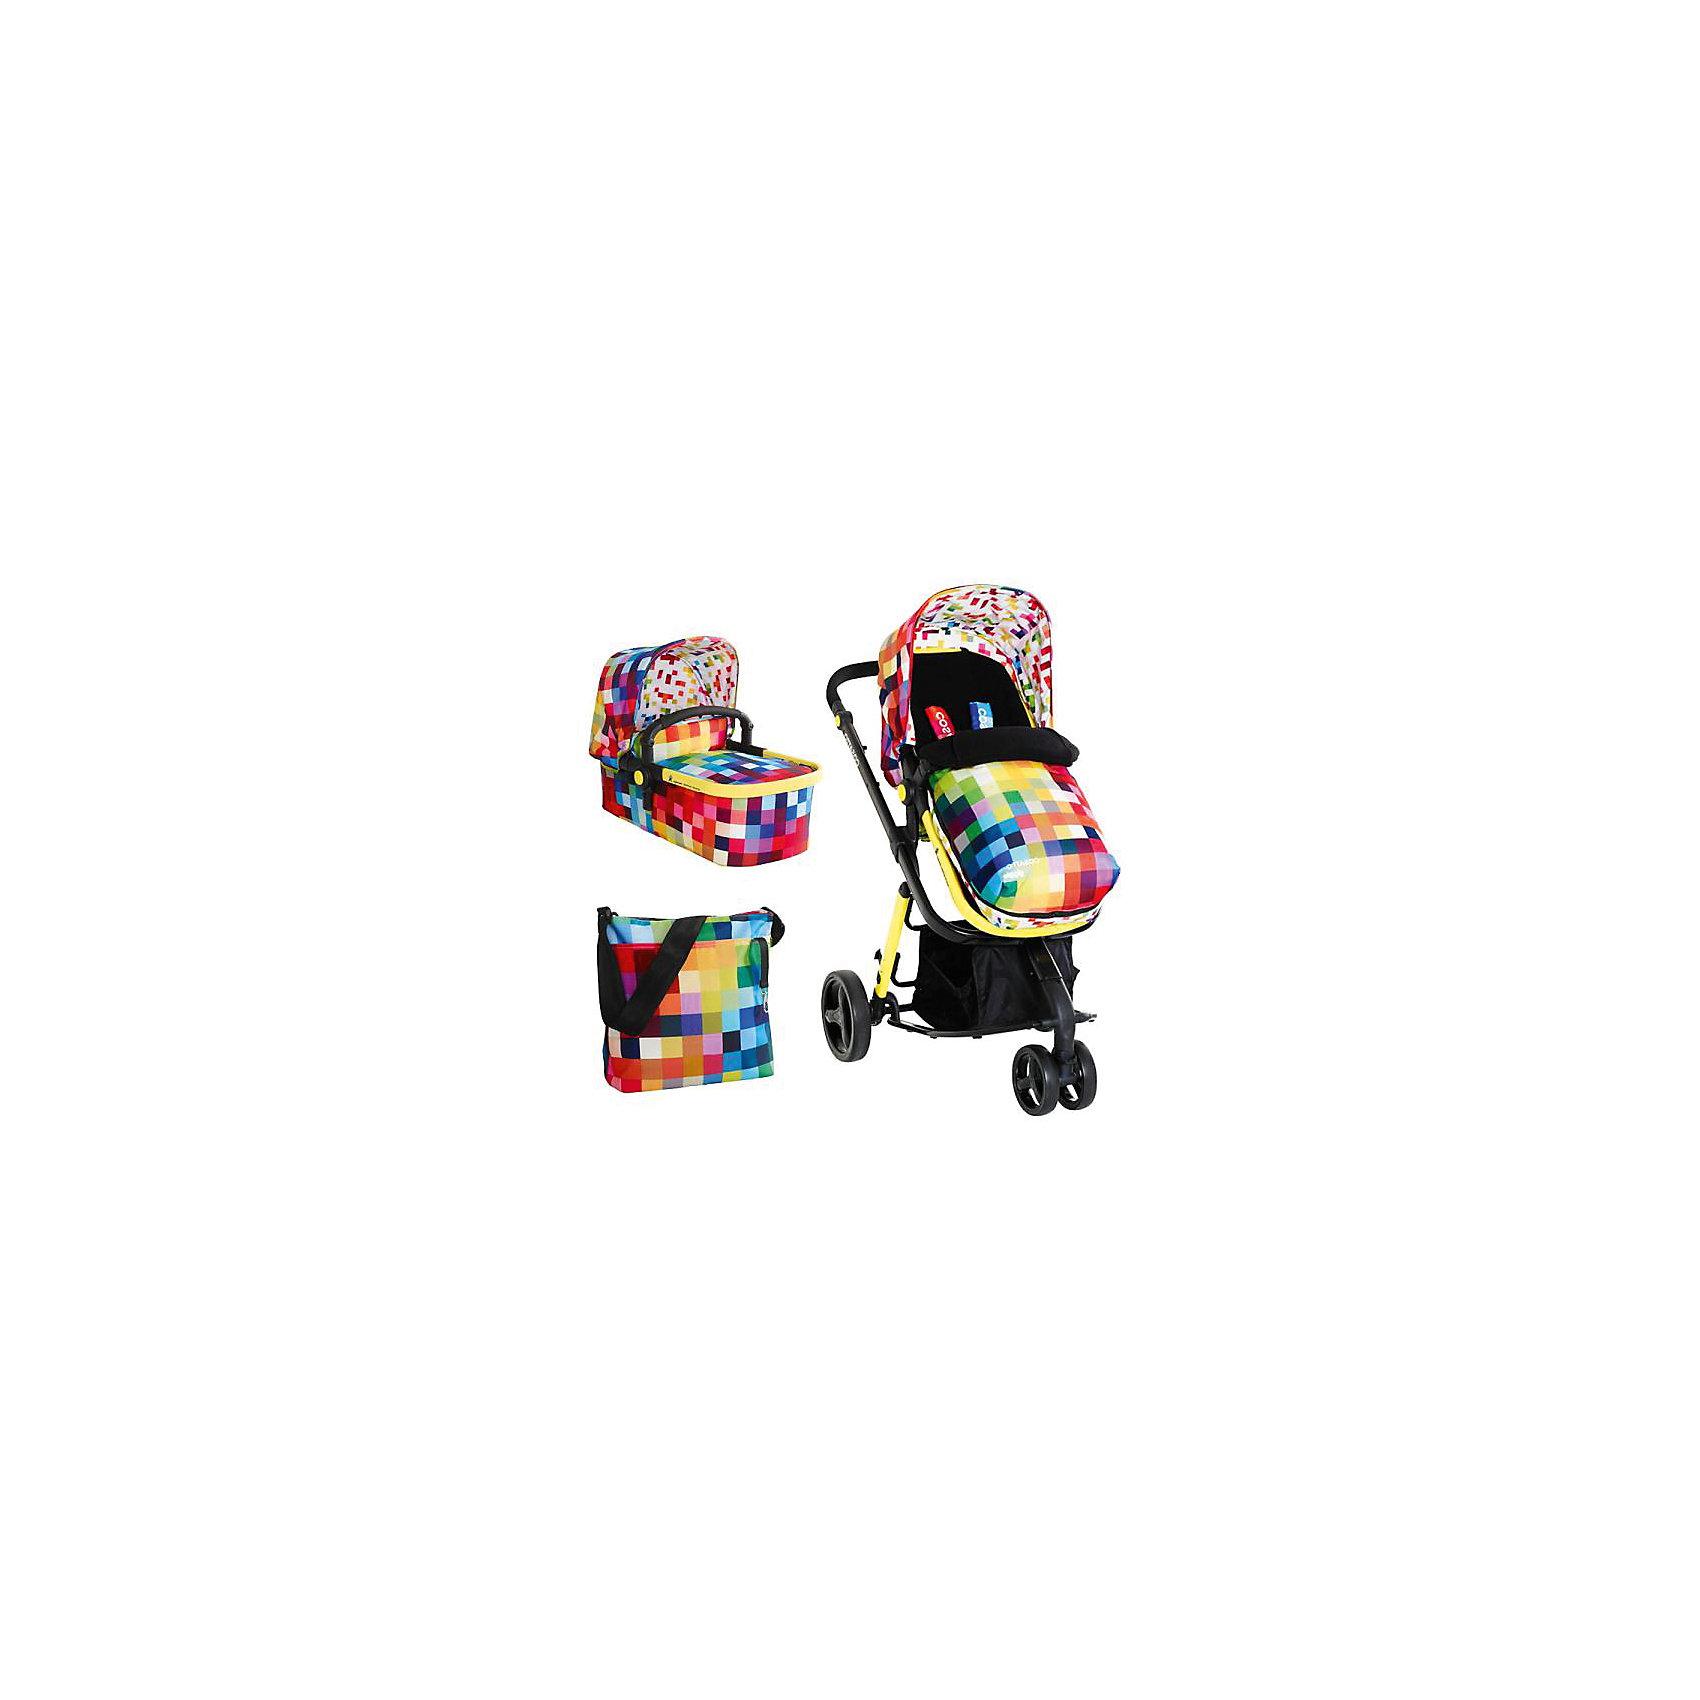 COSATTO Коляска 2 в 1 Giggle 2, Cosatto, Pixelate цены онлайн